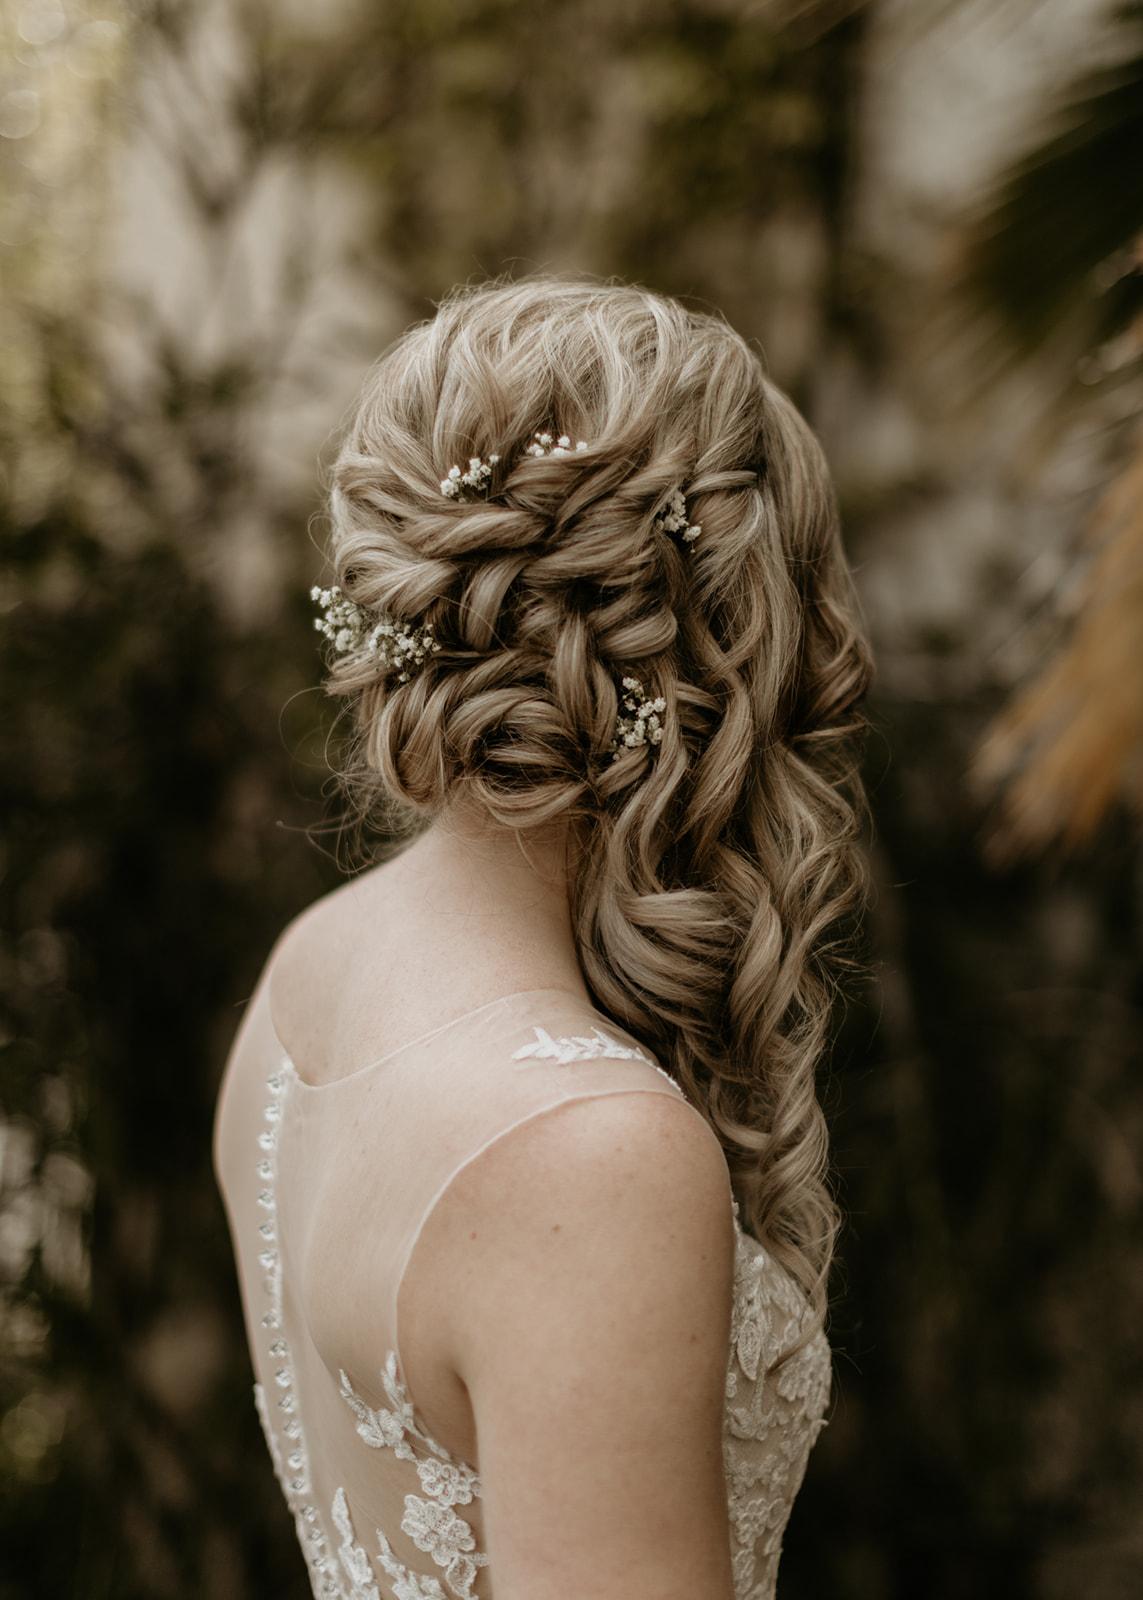 Twisted Curls Bridal Hair by Adorn Hair by Amanda Johnson